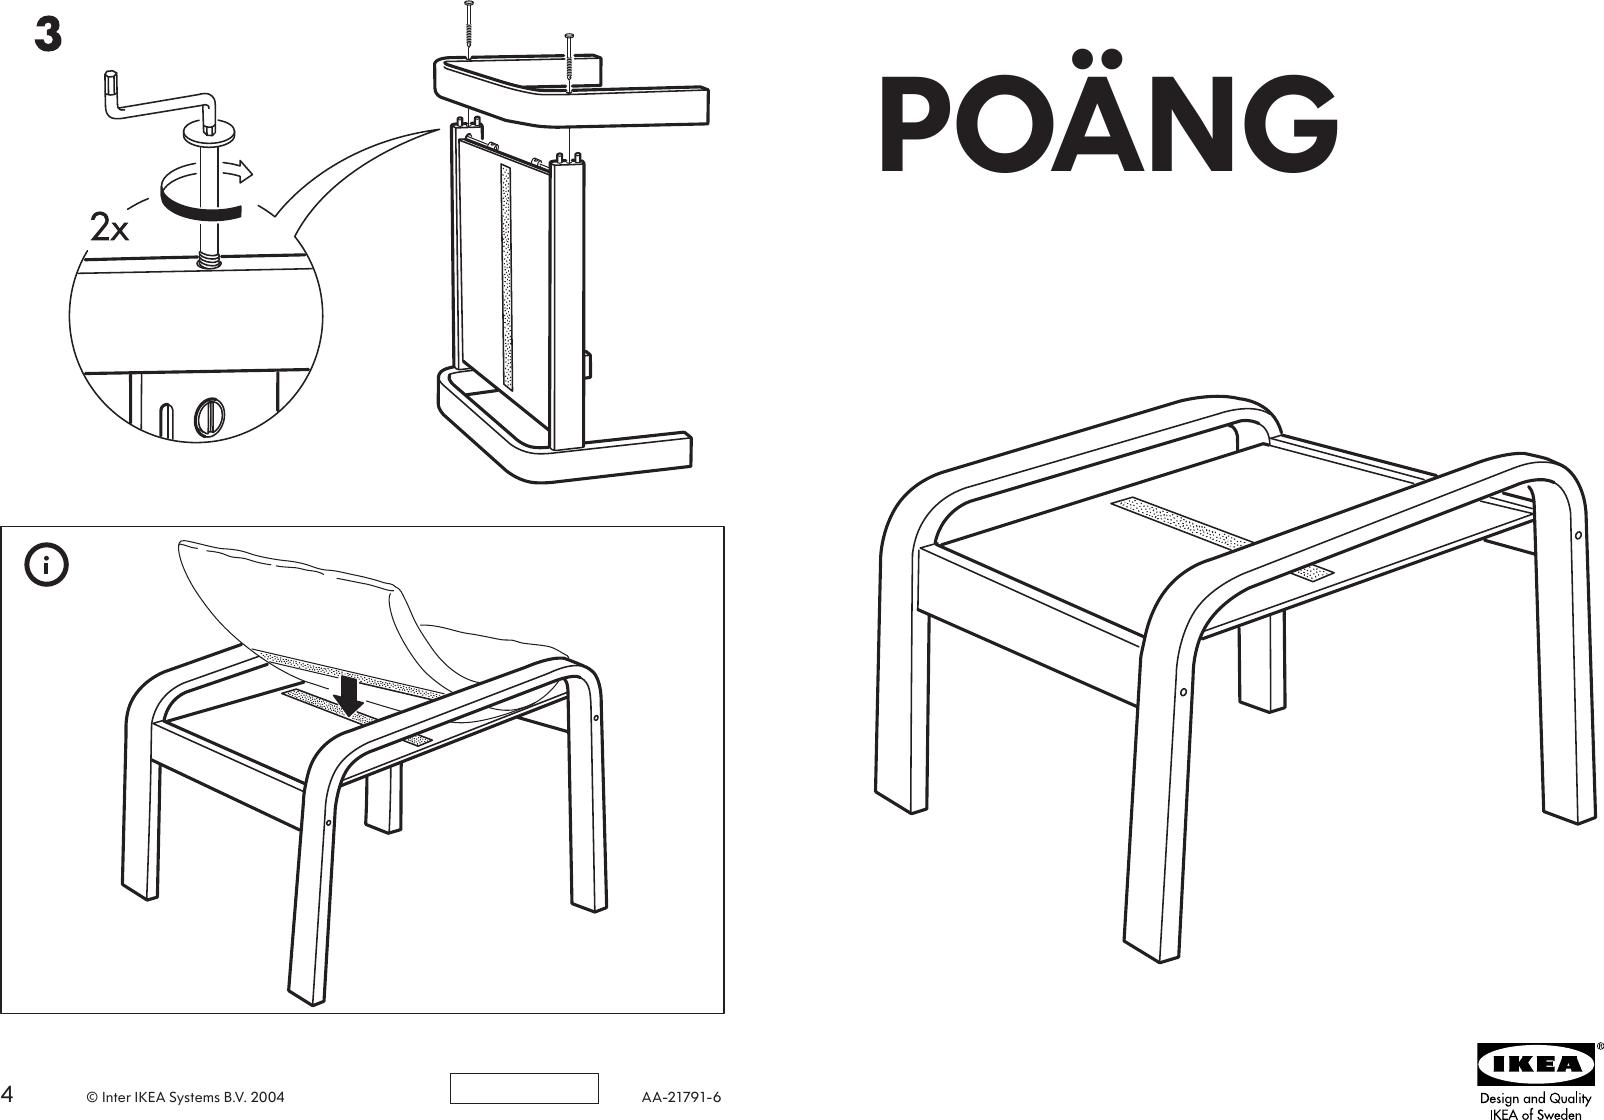 Tremendous Ikea Poang Footstool Frame Assembly Instruction Ibusinesslaw Wood Chair Design Ideas Ibusinesslaworg